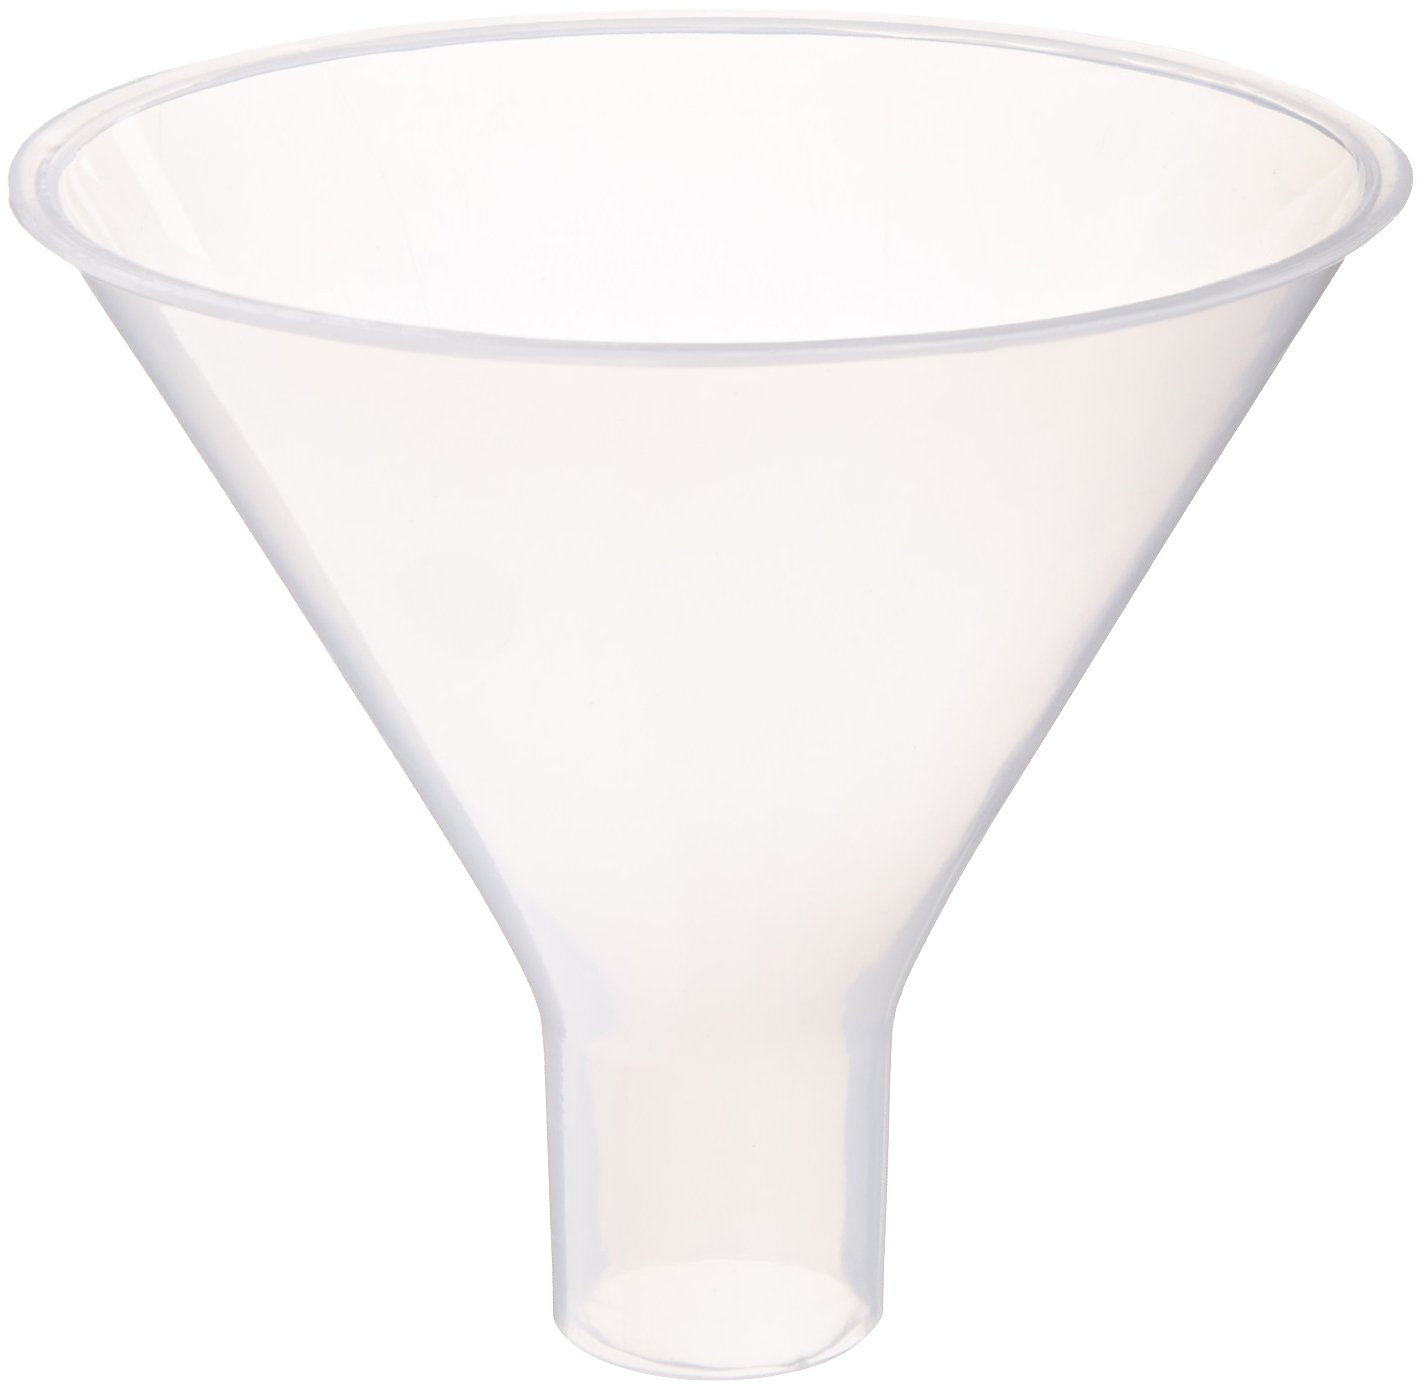 United Scientific FPP100 Polyethylene Powder Funnel, 150mL Capacity, Pack of Six